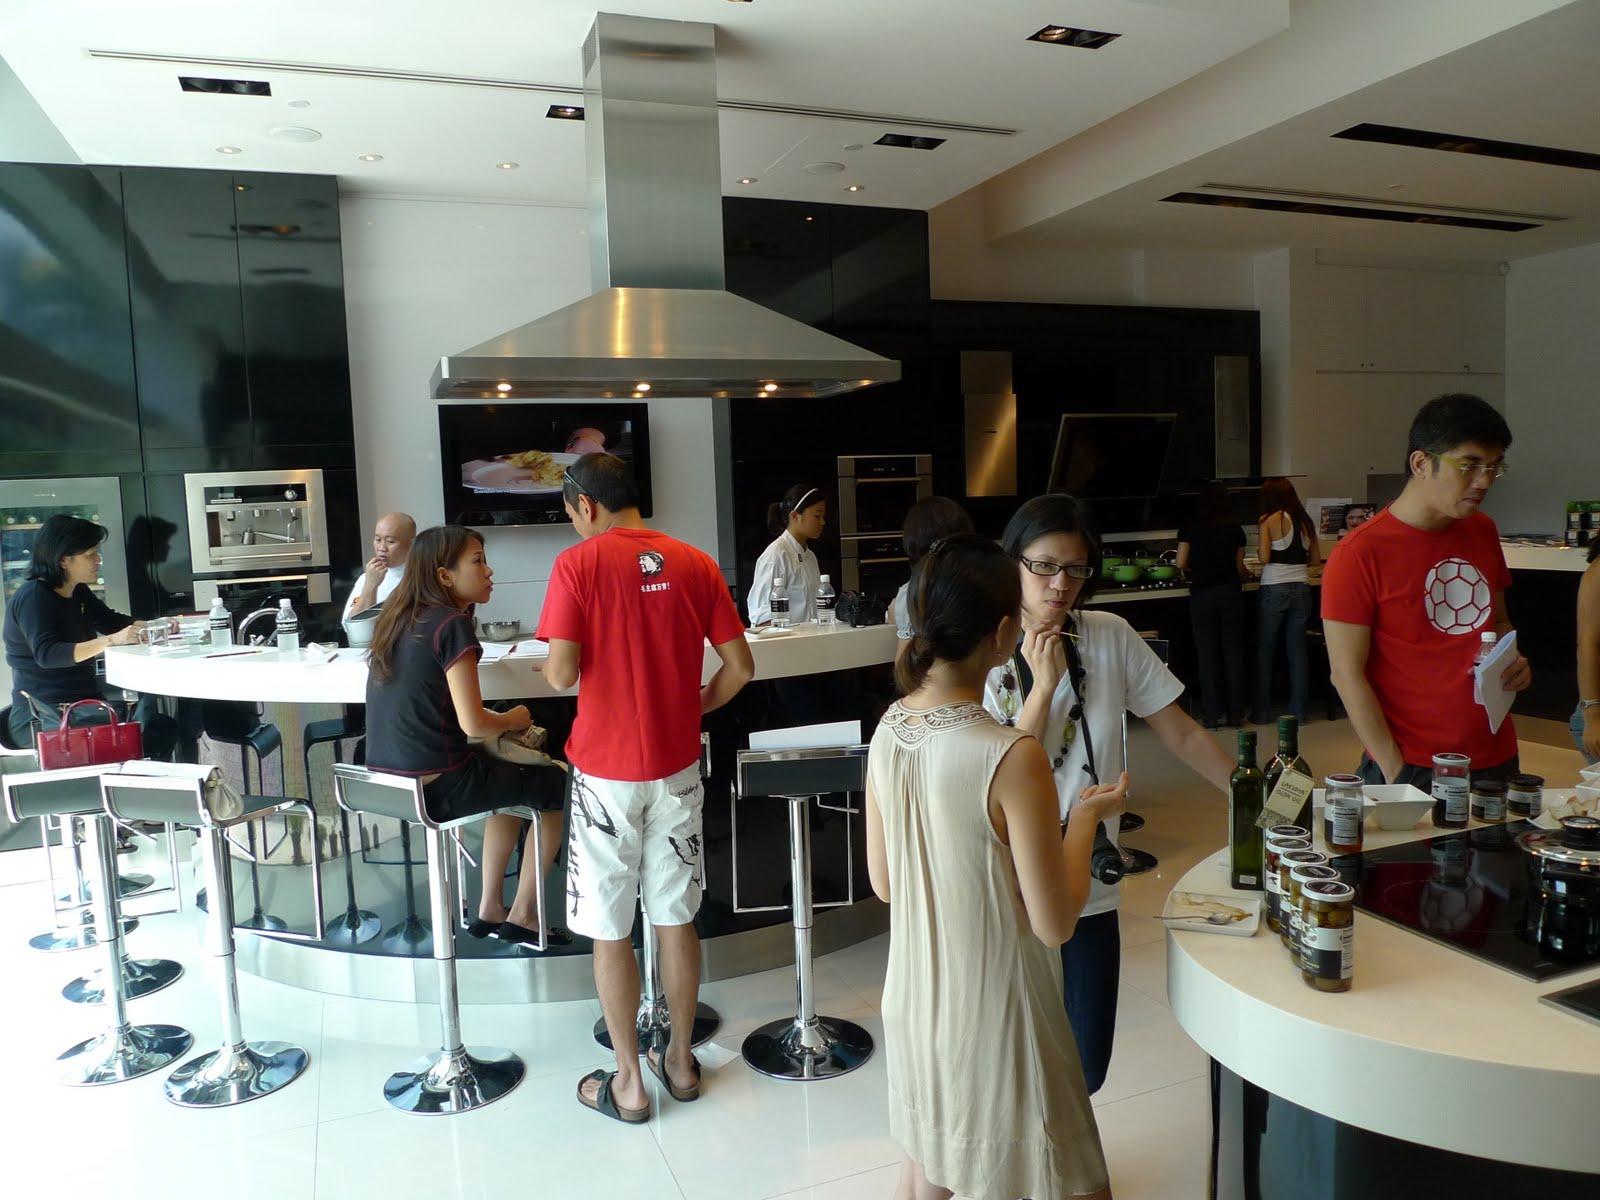 De Dietrich Kitchen Appliances The Hungry Cow De Dietrich Cooking Demo With Robin Ho